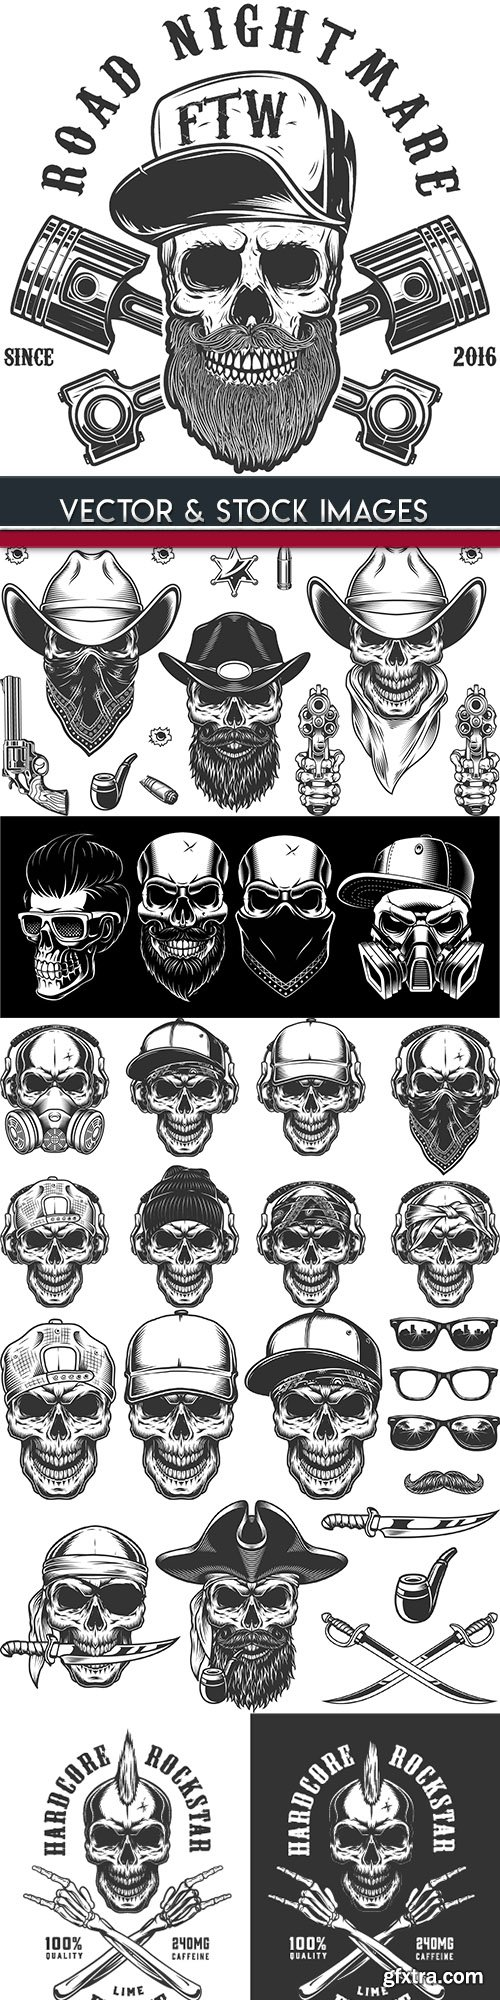 Skull and accessories grunge label drawn design 6